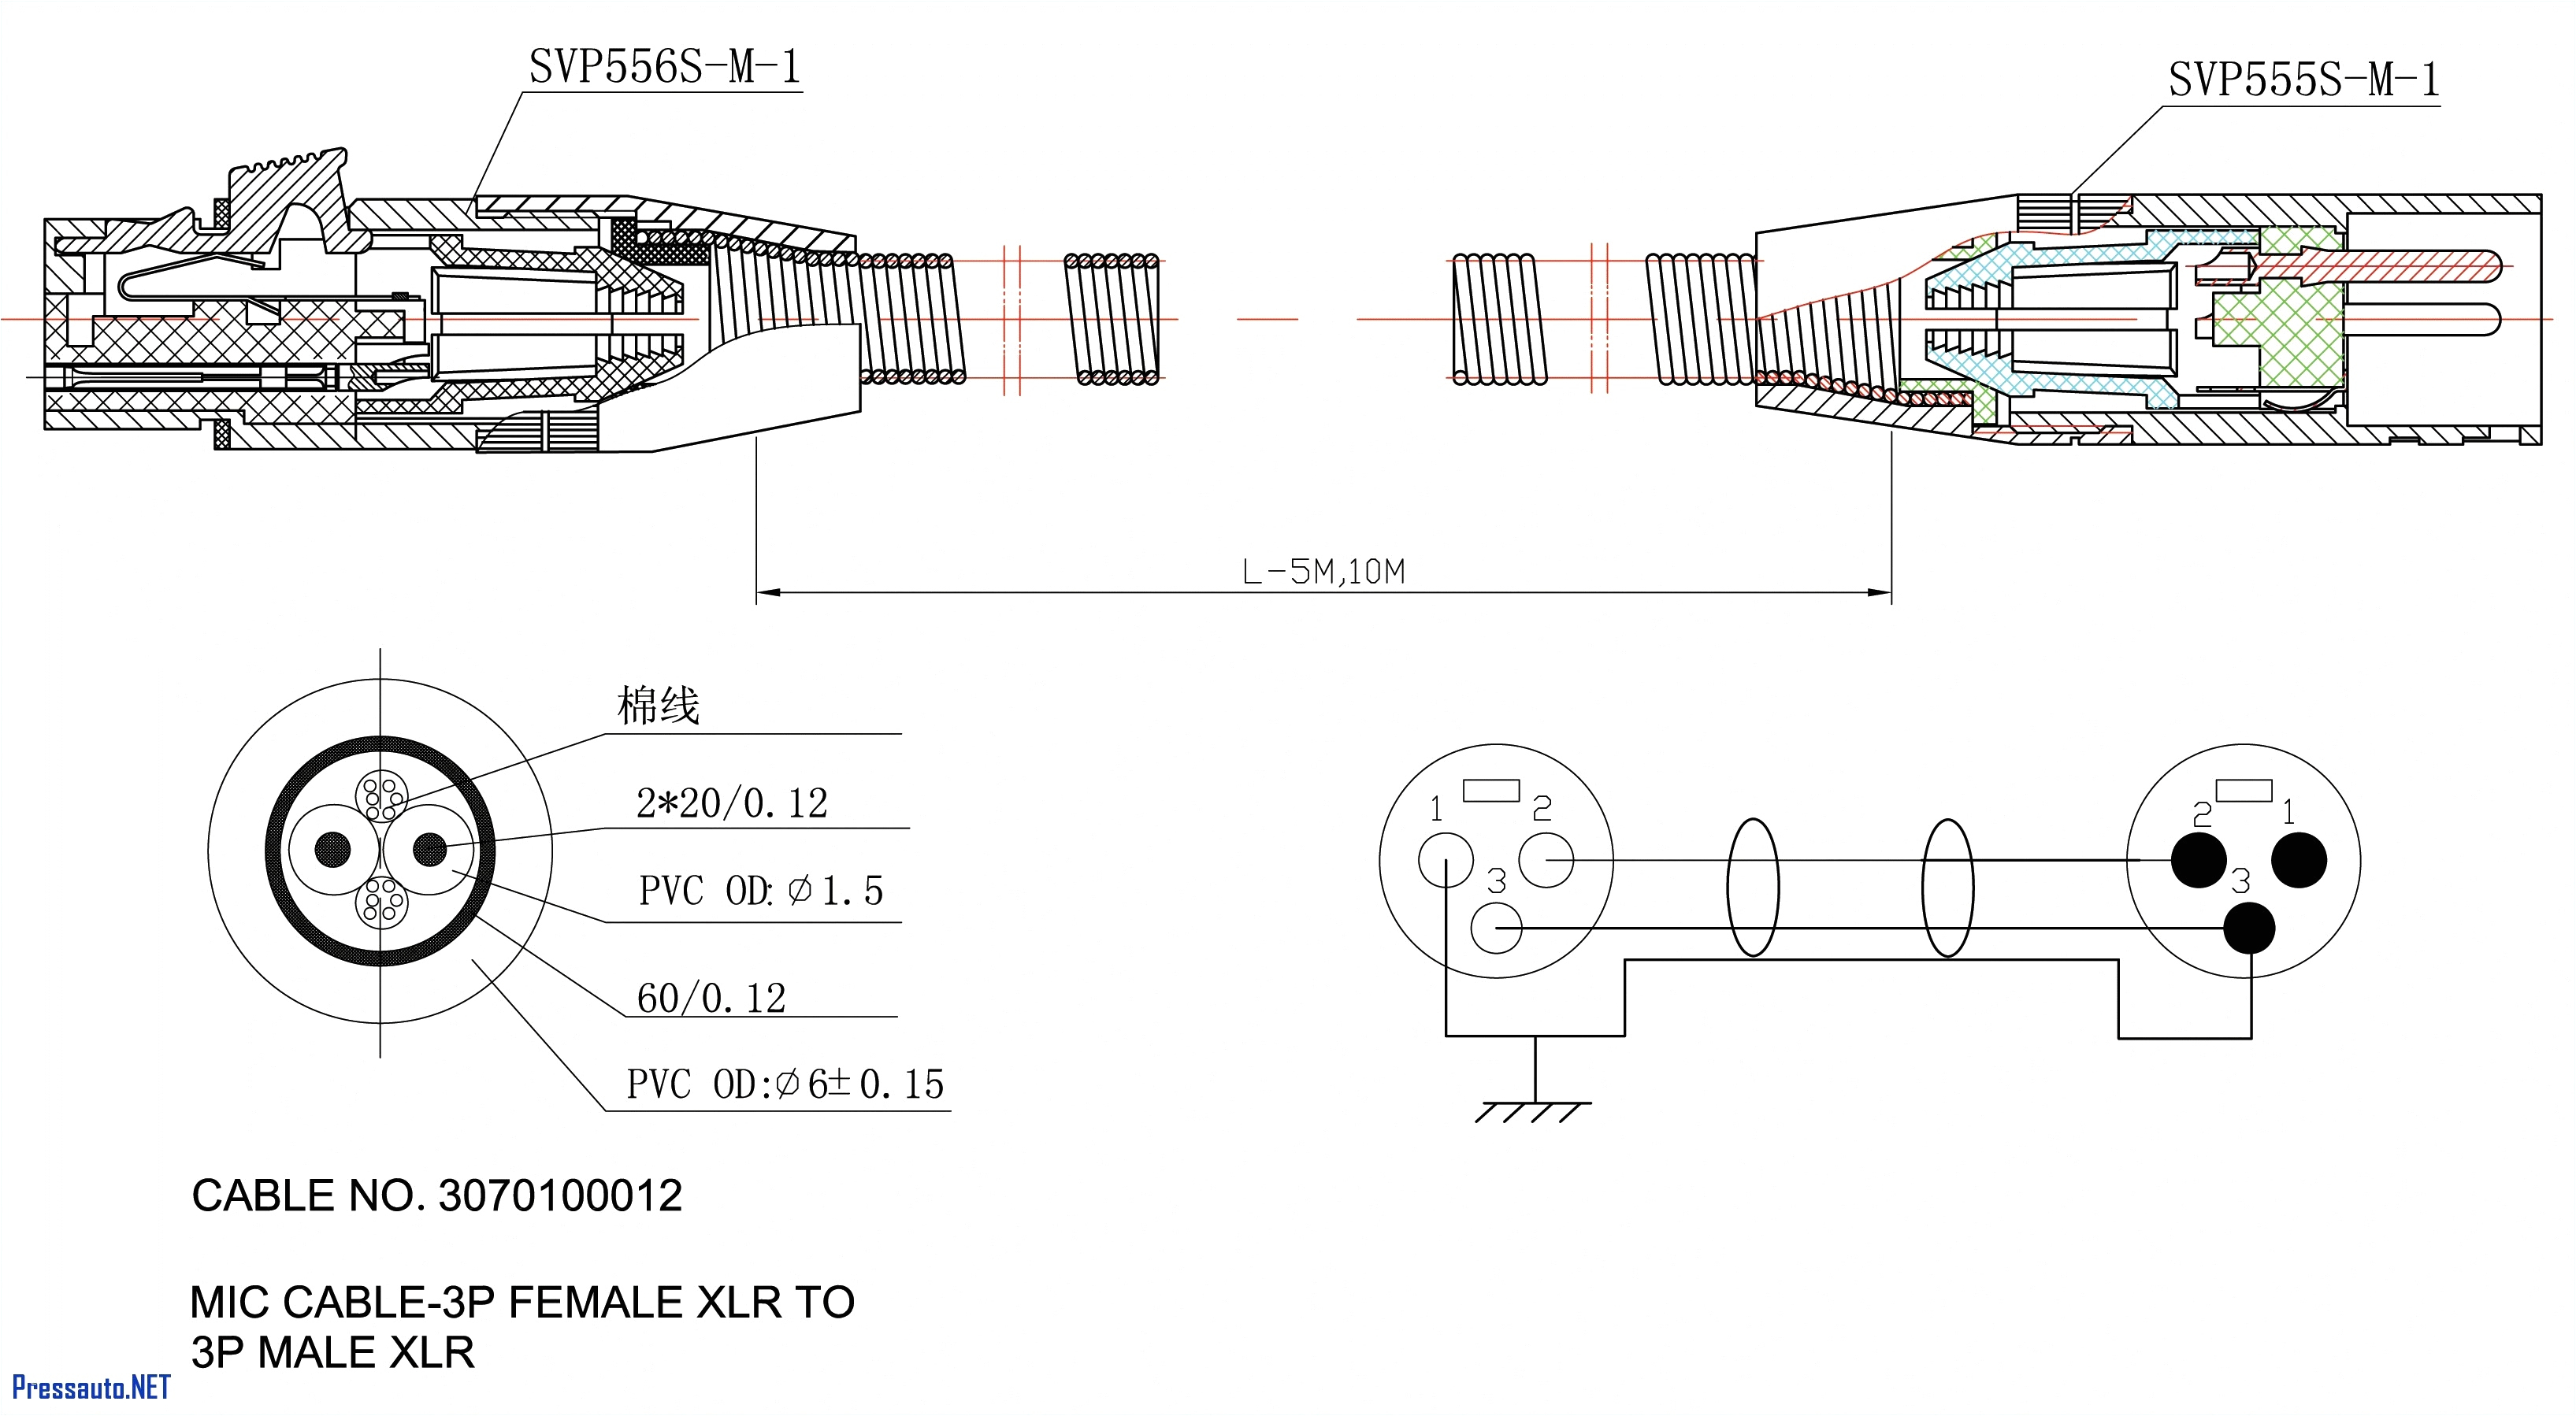 2015 ford f150 wiring diagram beautiful ford f150 trailer wiring 2016 f150 trailer wiring diagram 2015